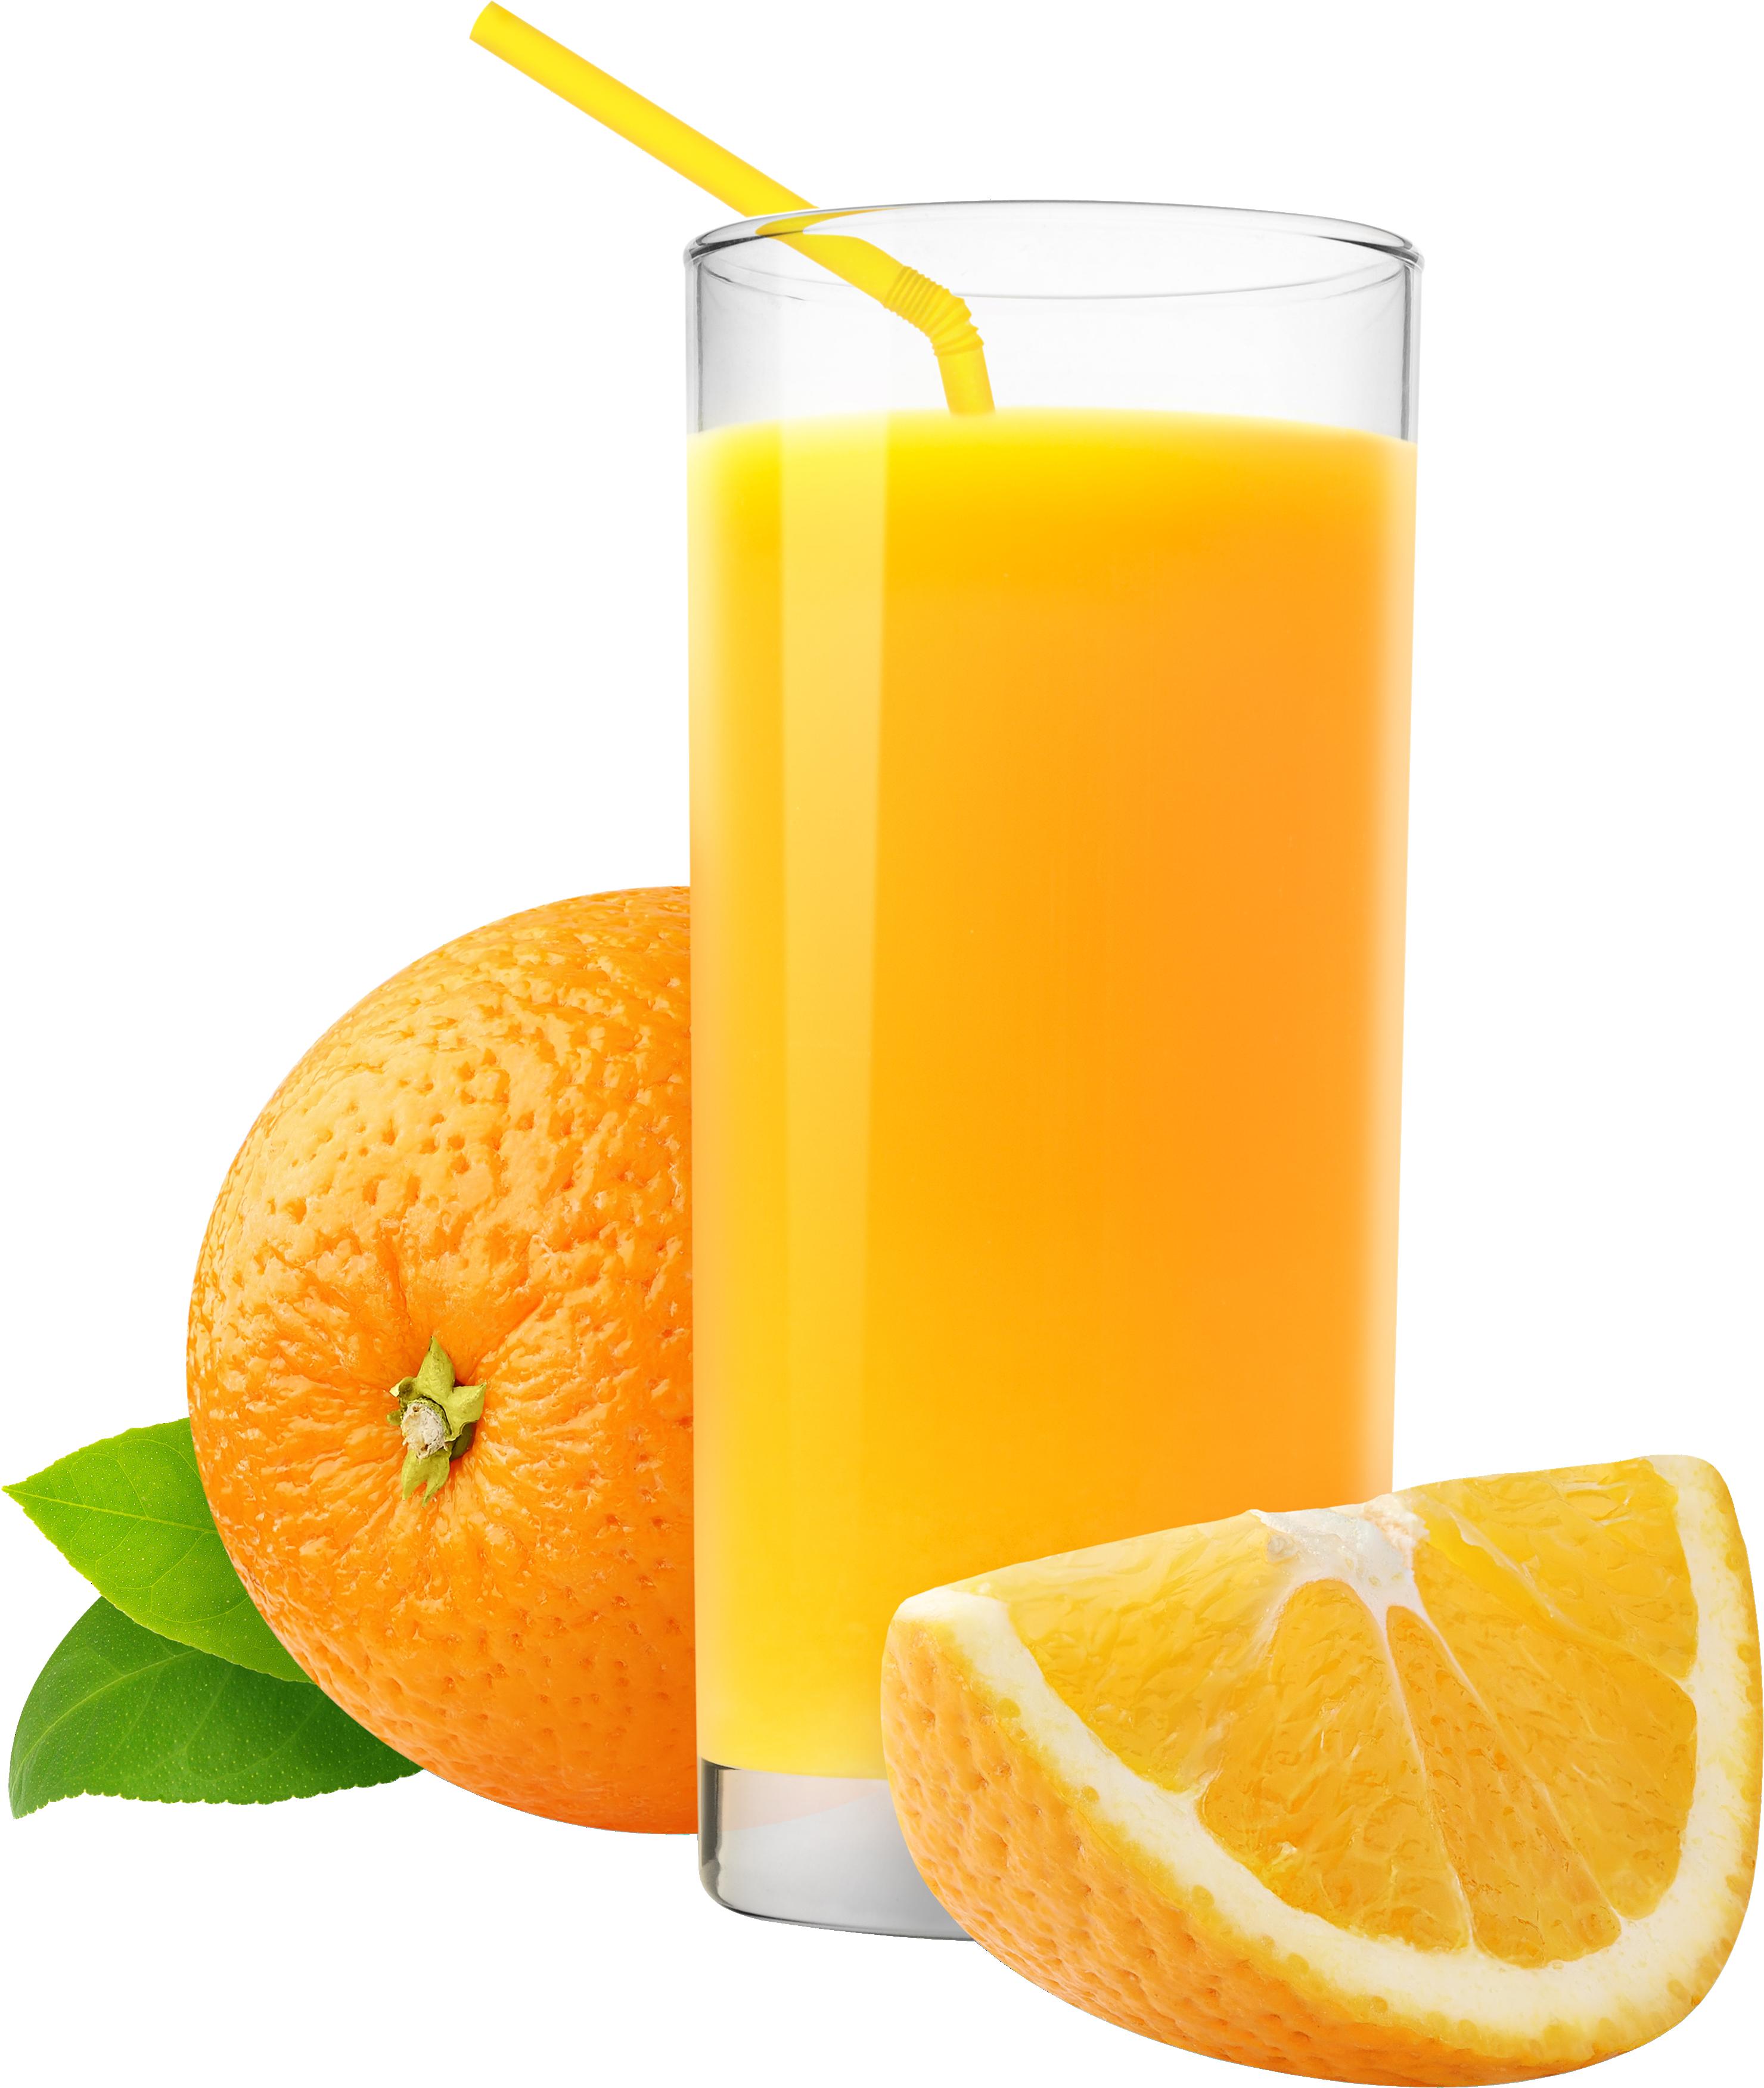 Apple juice clipart png png transparent stock Free PNG Juice Transparent Juice.PNG Images. | PlusPNG png transparent stock